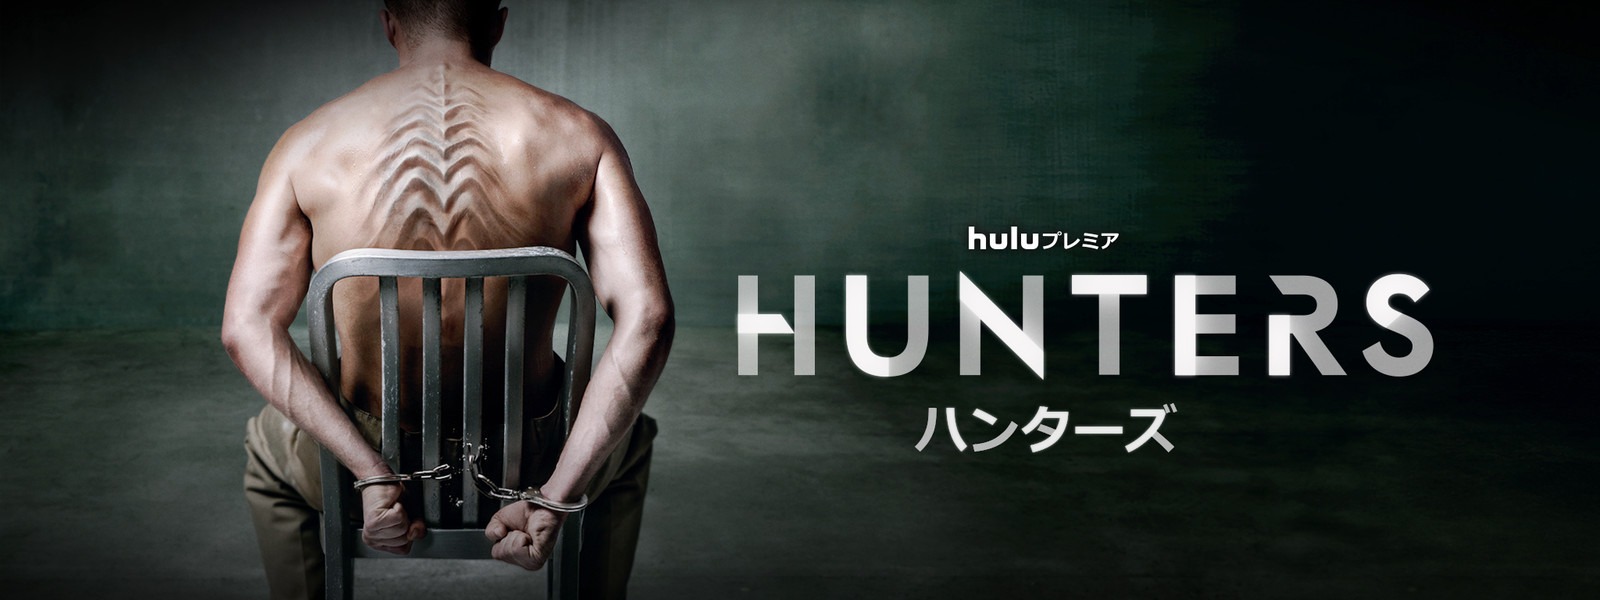 Hunters/ハンターズ